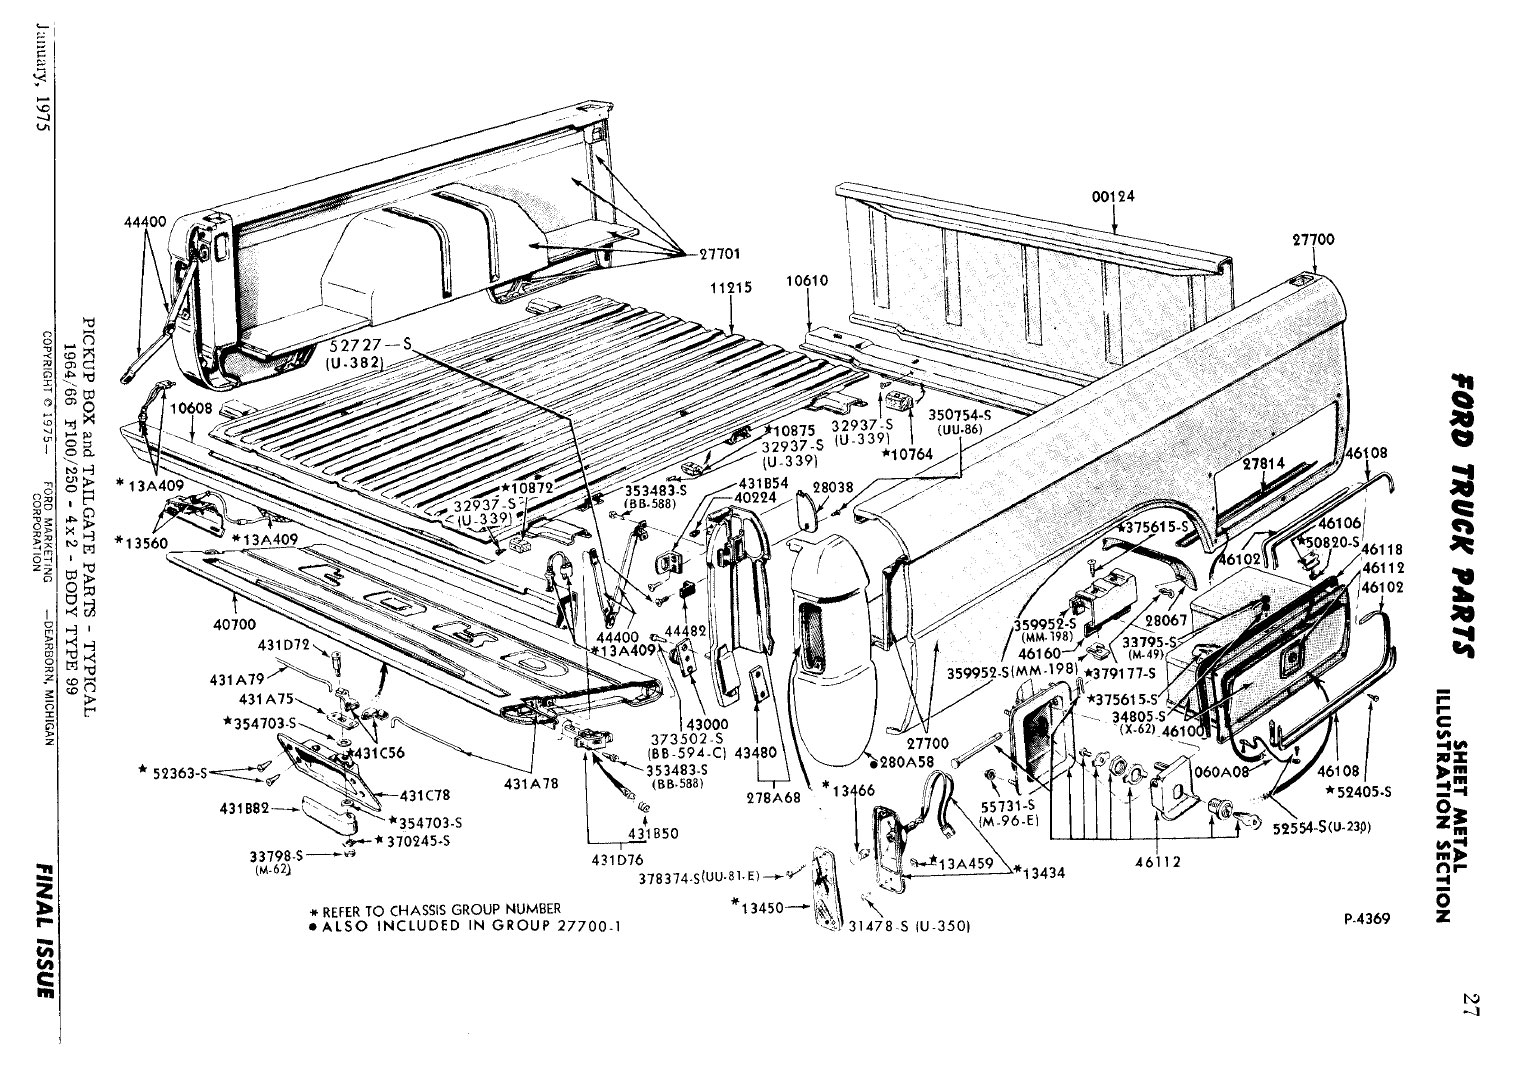 68 F100 Bedside Toolbox